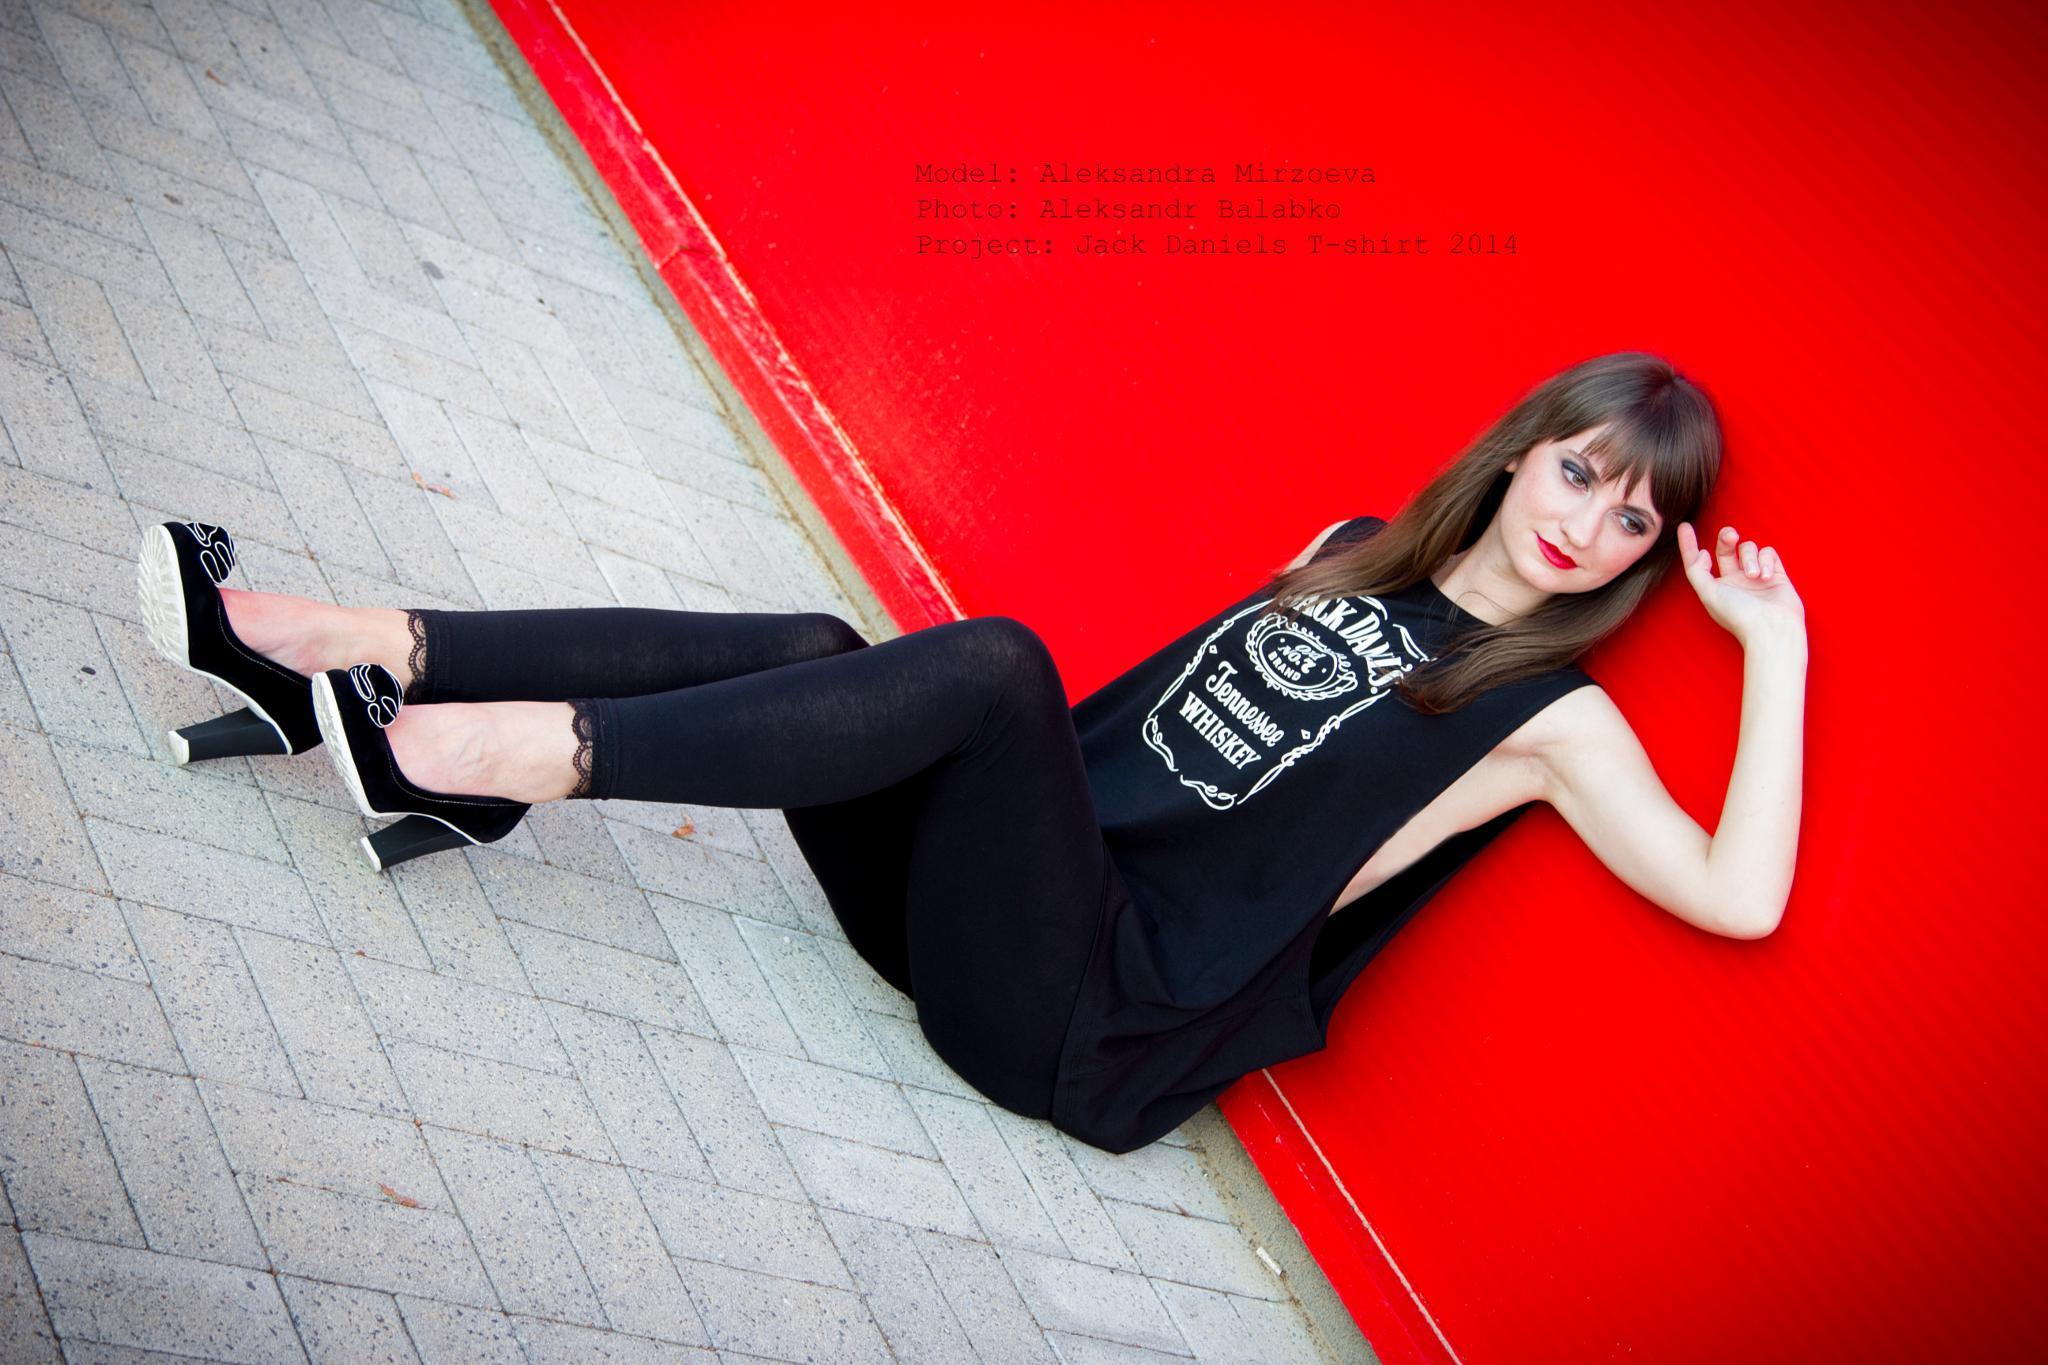 Jack Daniels T-Shirt by Alexandr Balabko